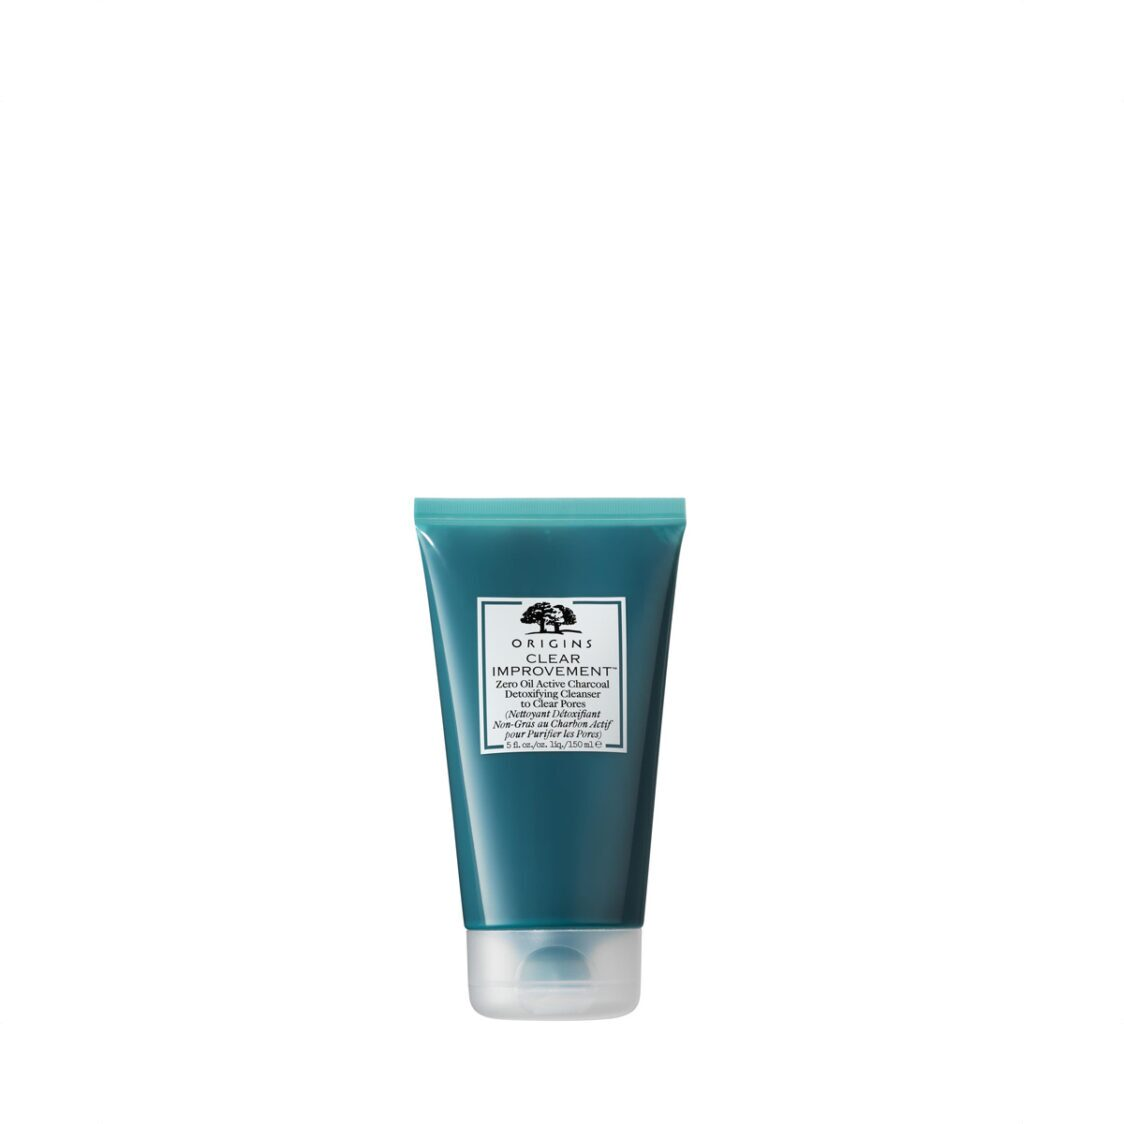 Origins Clear Improvement Zero Oil Face Wash 150ml